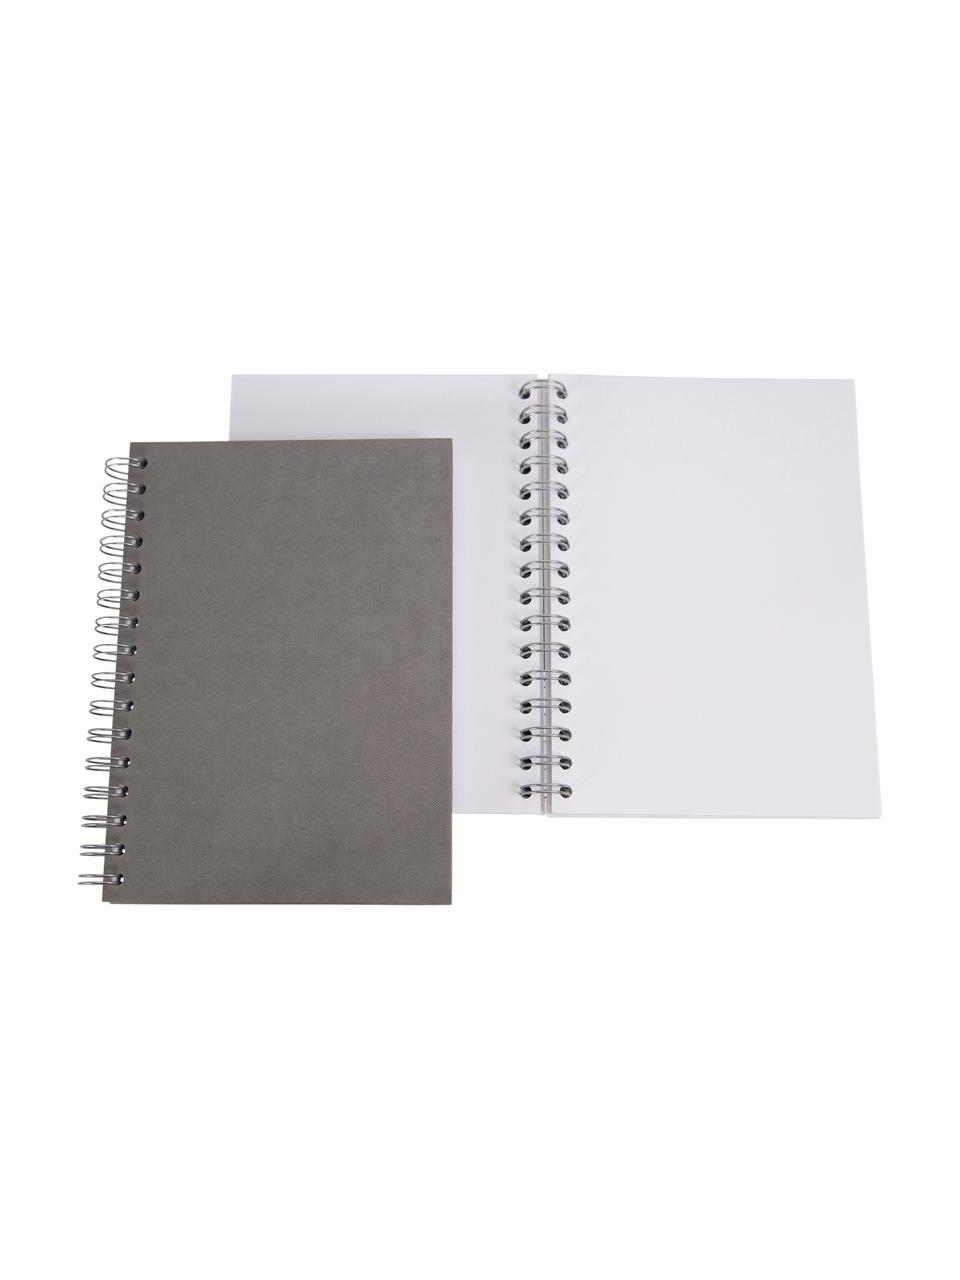 Notizbuch Bürli, Grau, 16 x 21 cm